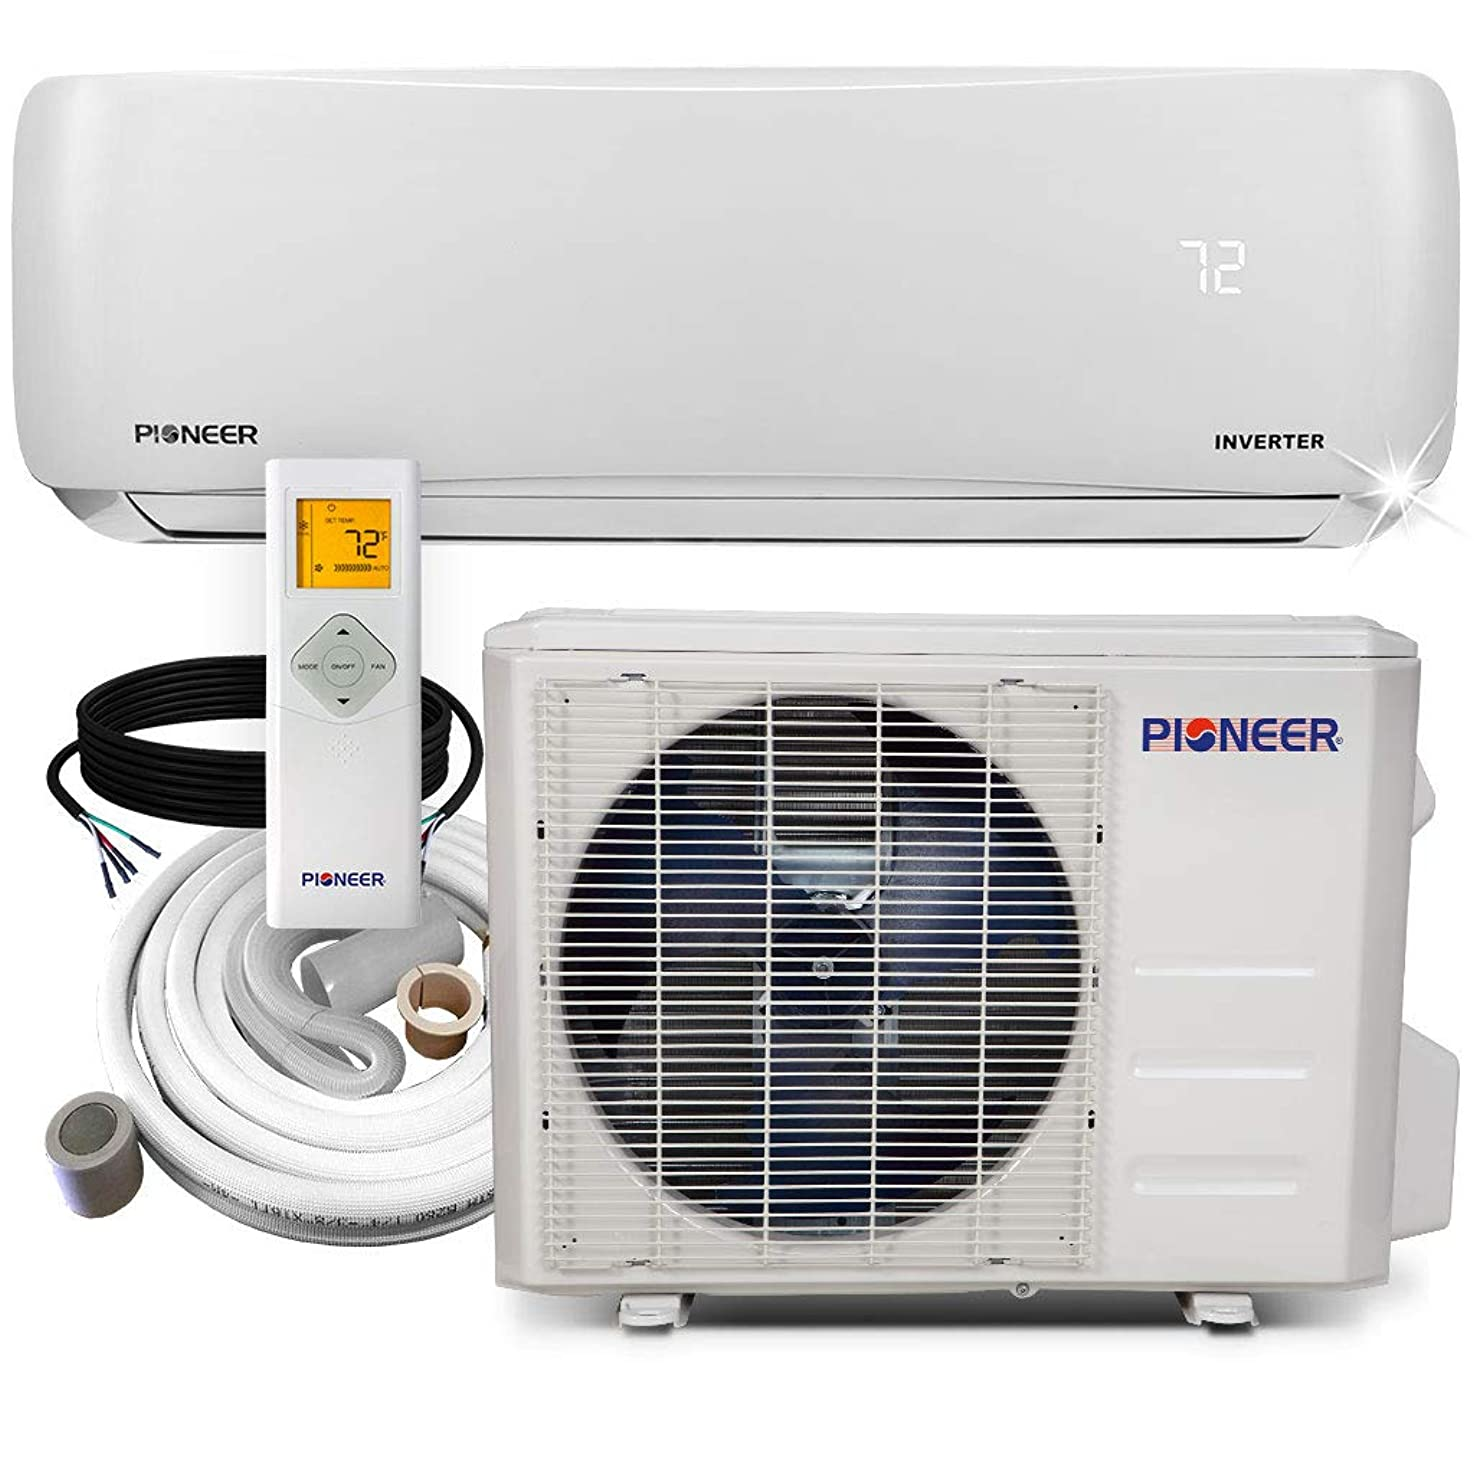 PIONEER Air Conditioner WYS018GMFI22RL Mini Split Heat Pump, 18000 BTU-208/230 V nhvzloetxnqfr4